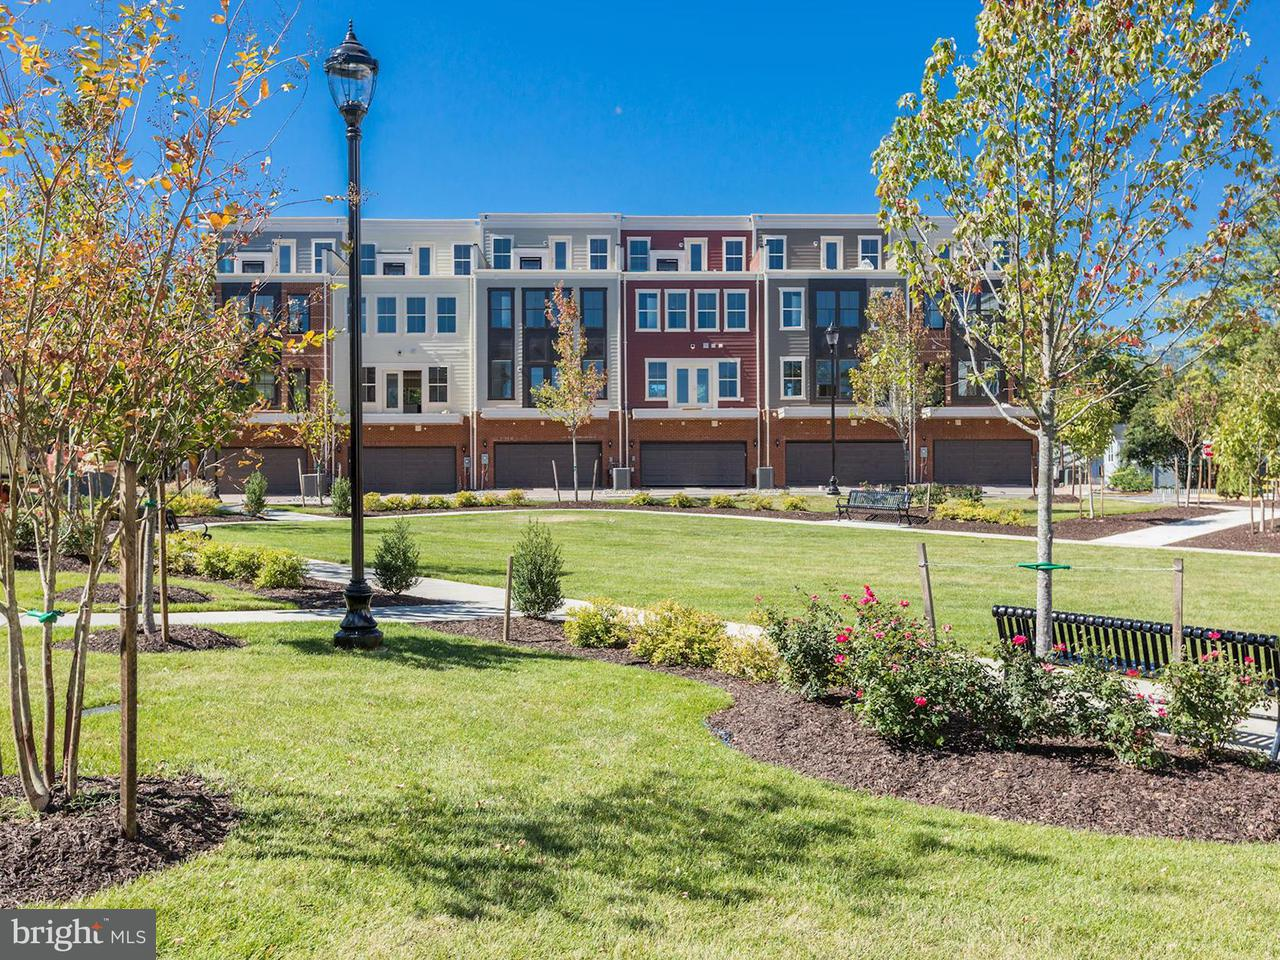 Additional photo for property listing at 3989 Norton Pl #106 3989 Norton Pl #106 Fairfax, Virginia 22030 États-Unis